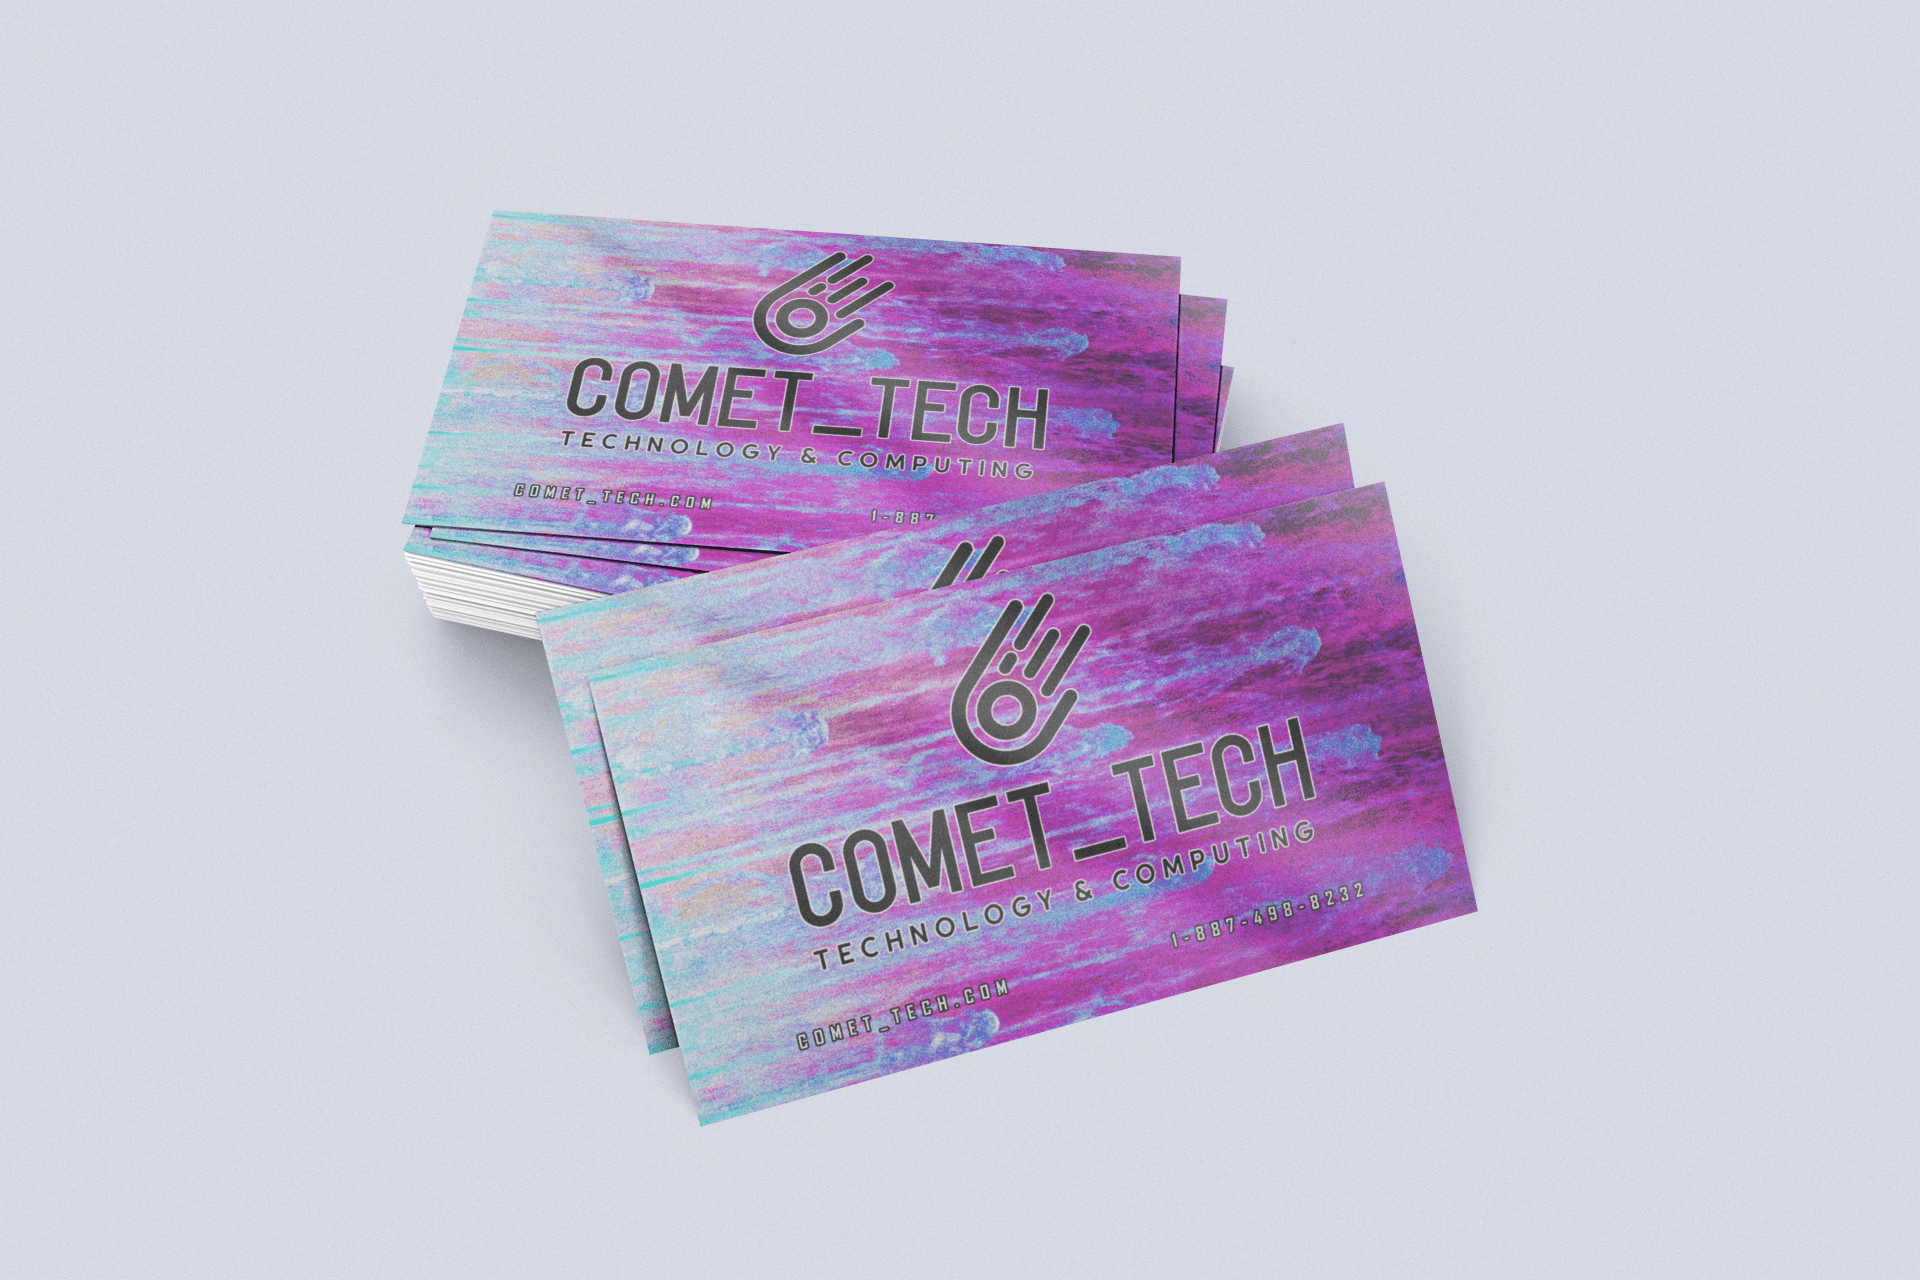 metallic business cards, akwafoil metallic business cards metallic business card printing anyfoil business card_min